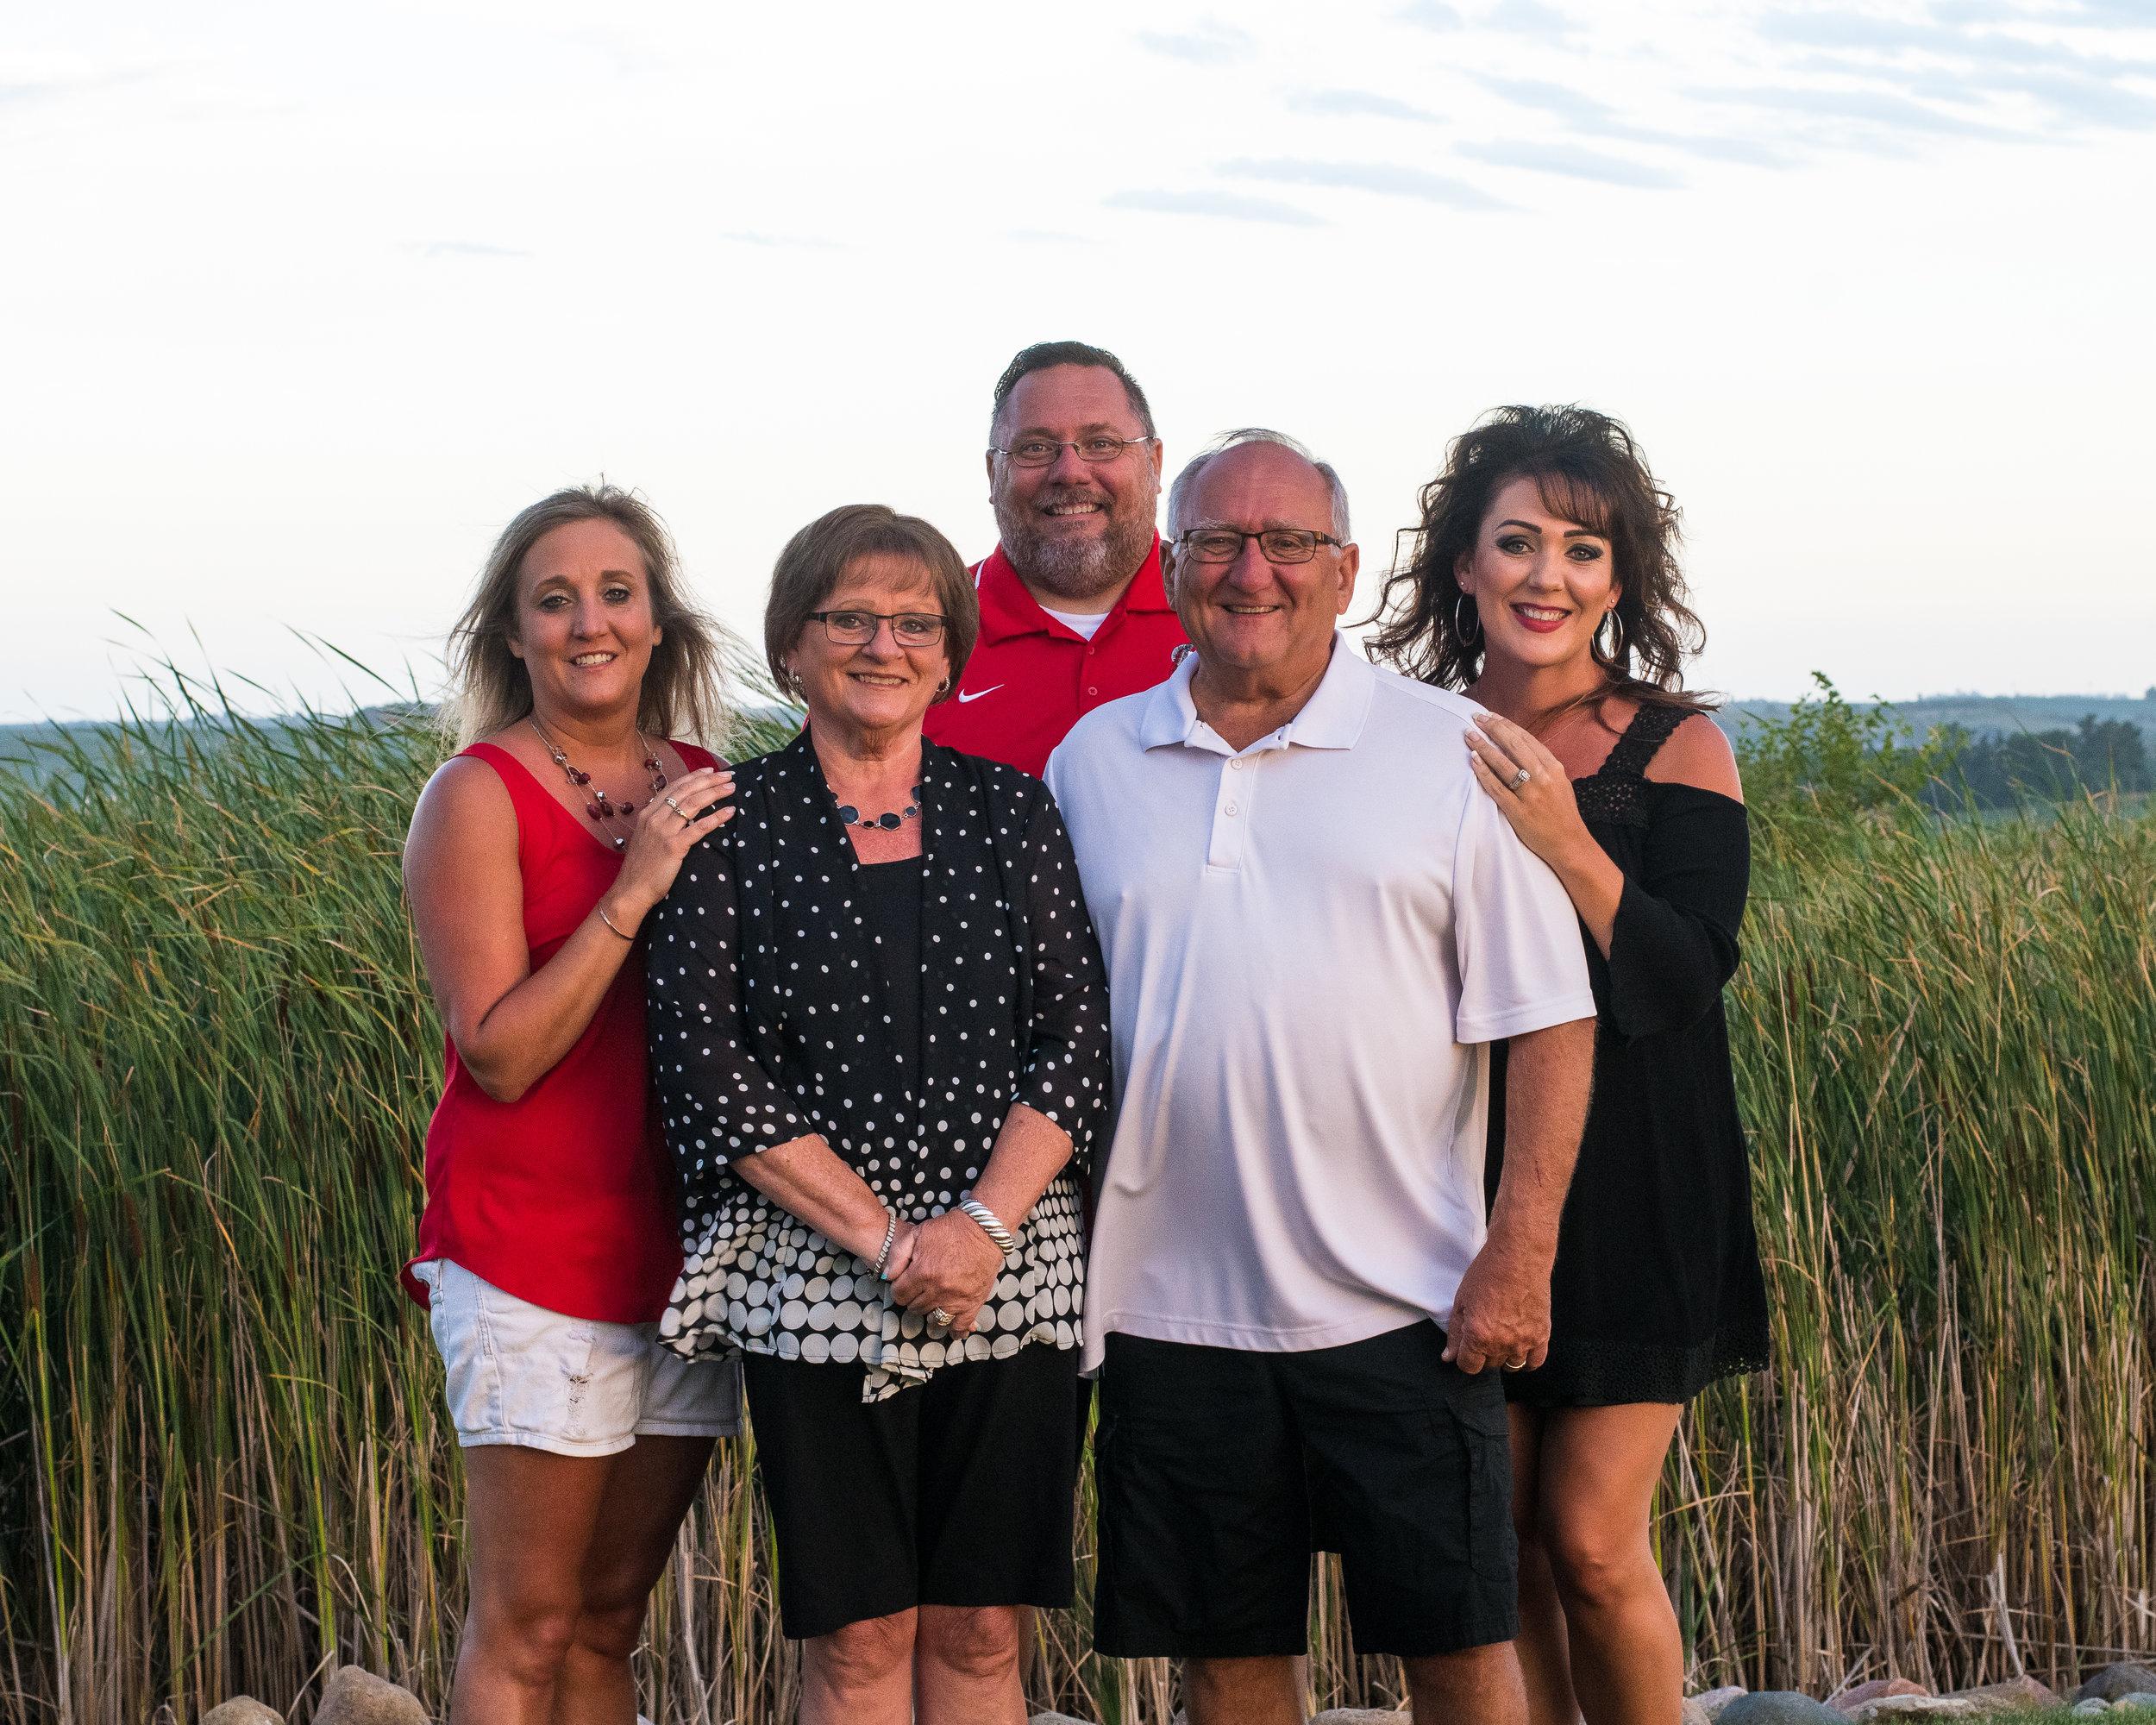 Hinckley Harlan Family Portraits 2019 (51 of 68).jpg